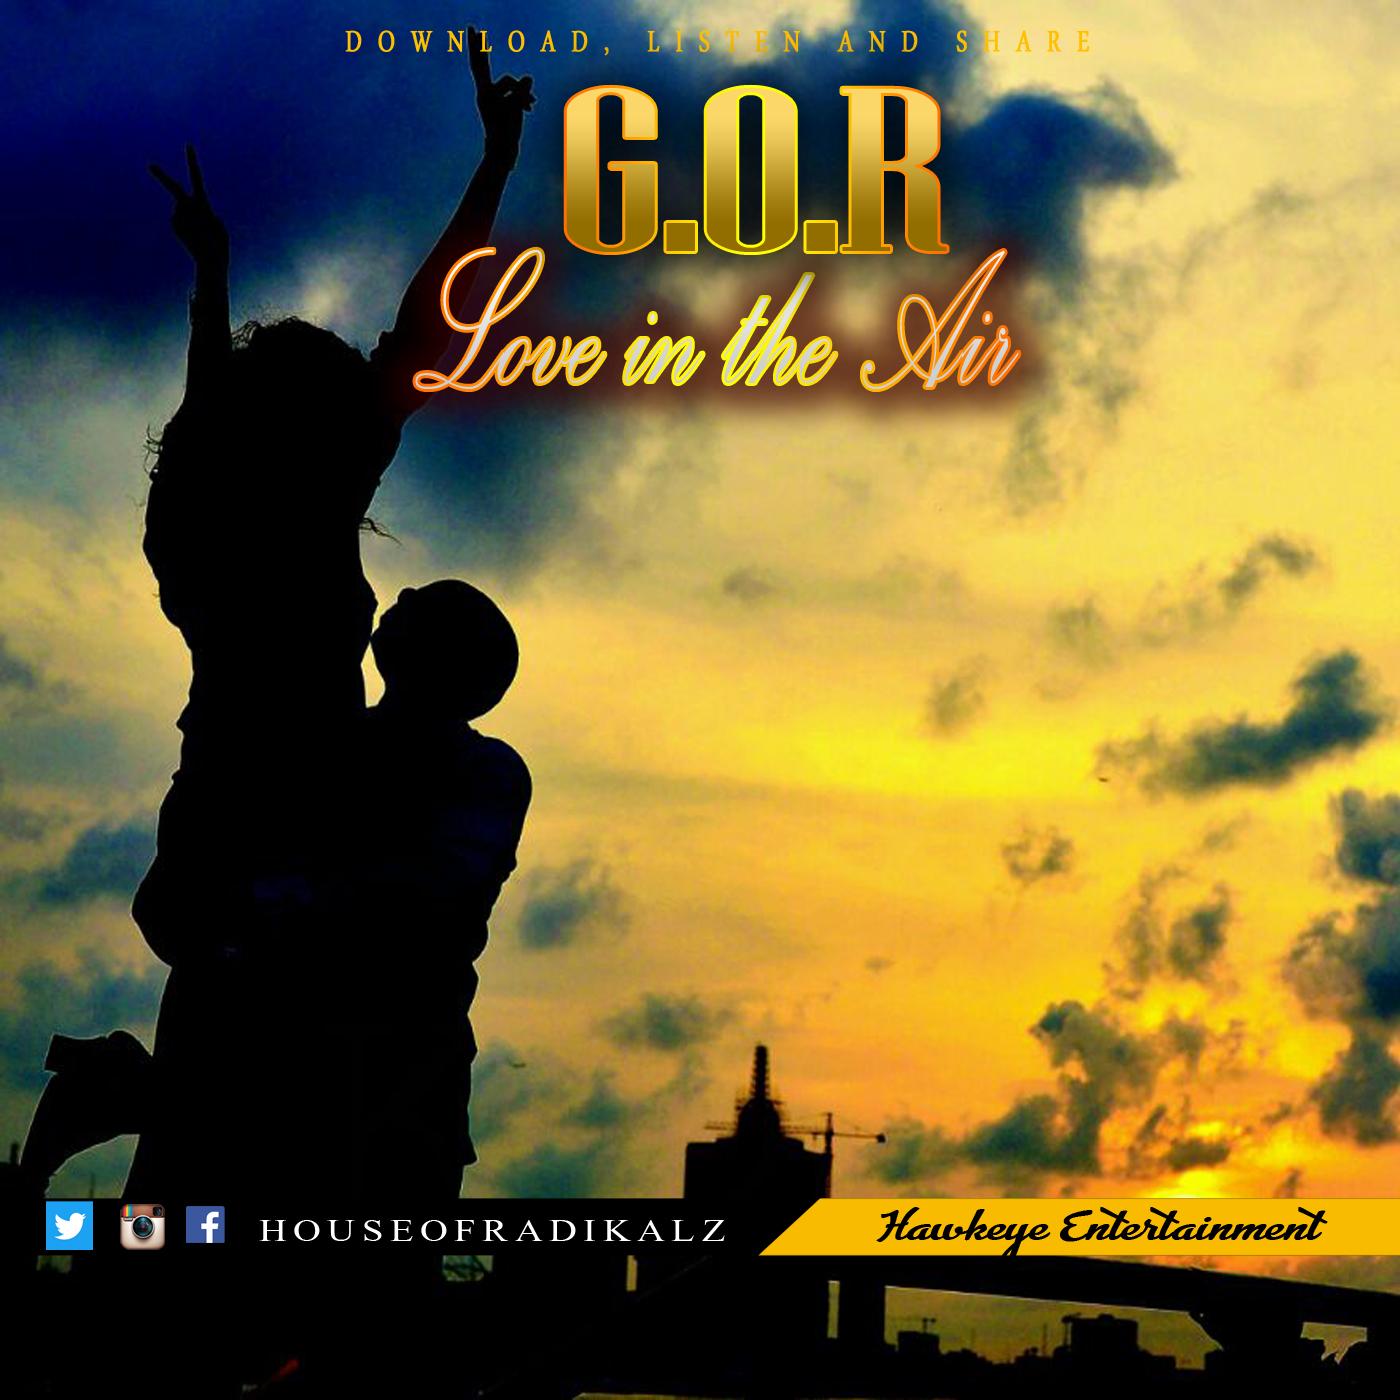 Love In The Air - GOR (11) [@houseofradikalz]